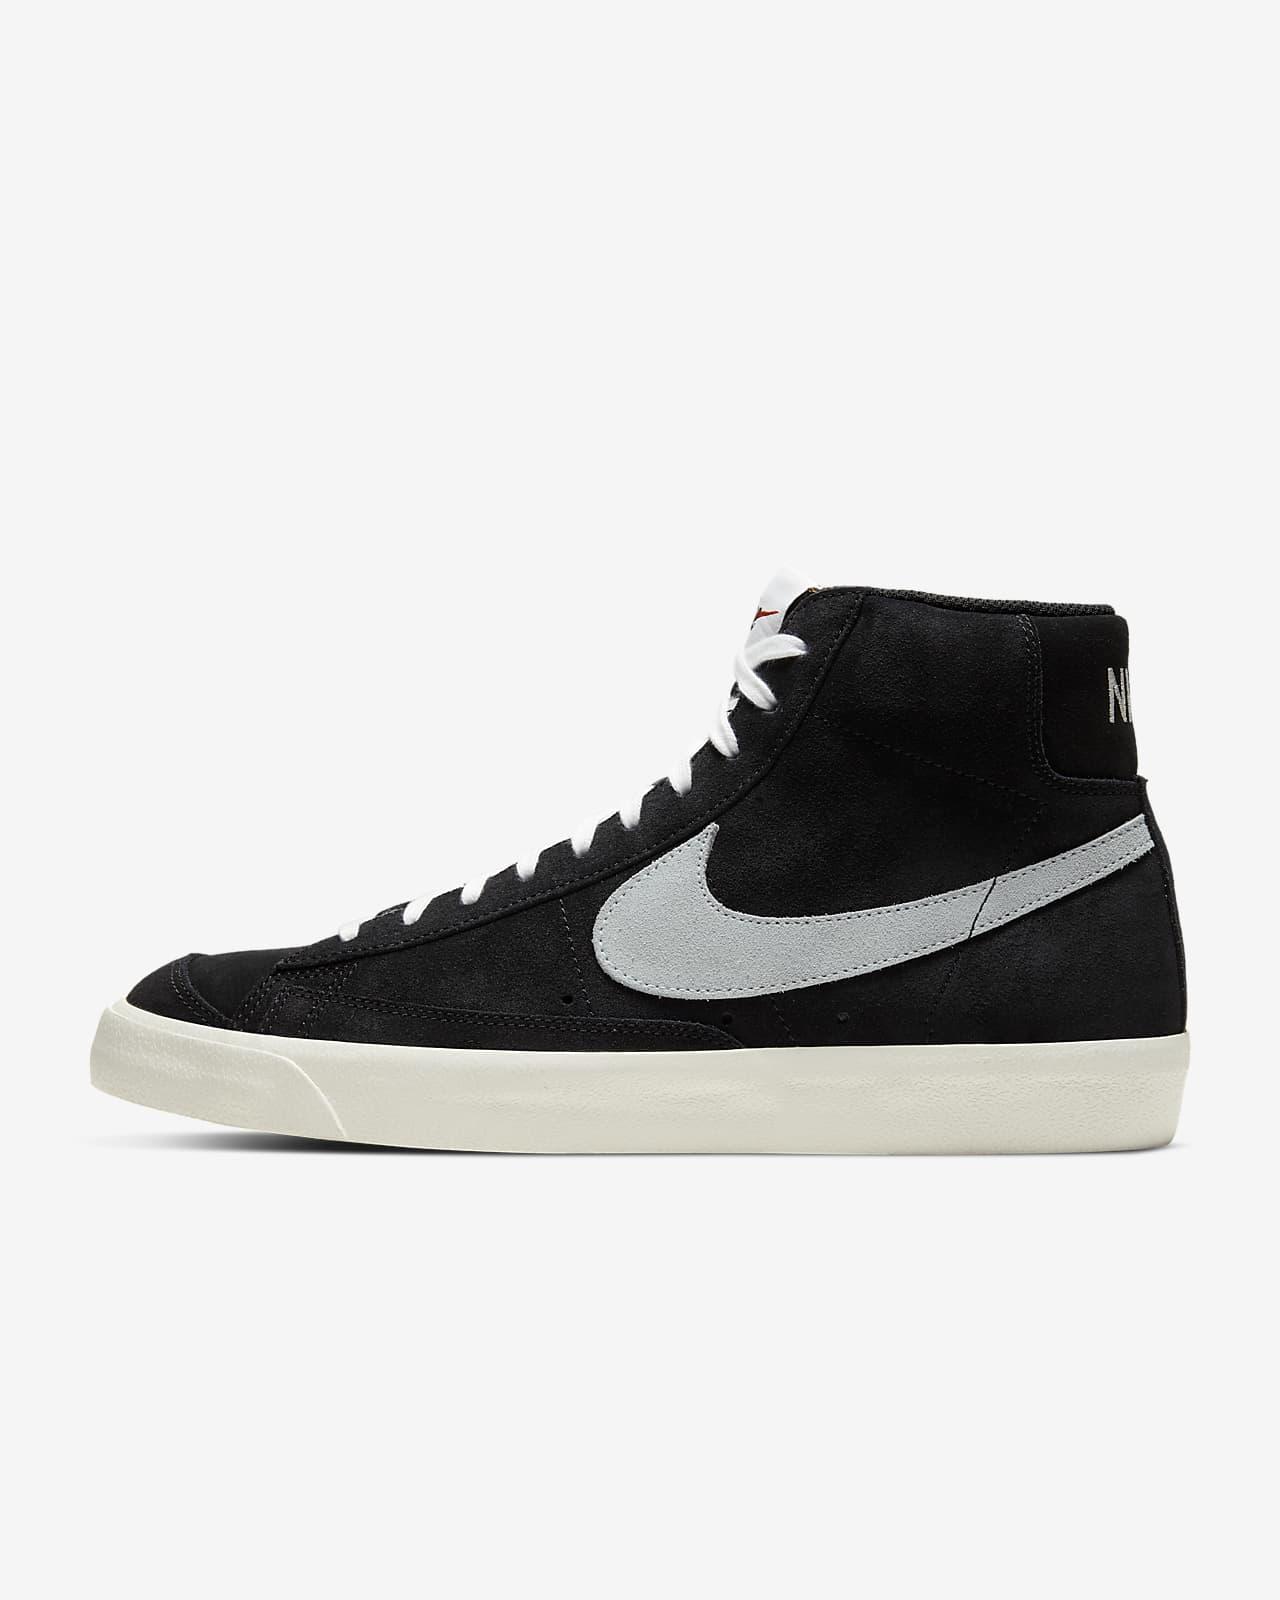 Nike Blazer Mid '77 Shoe. Nike LU